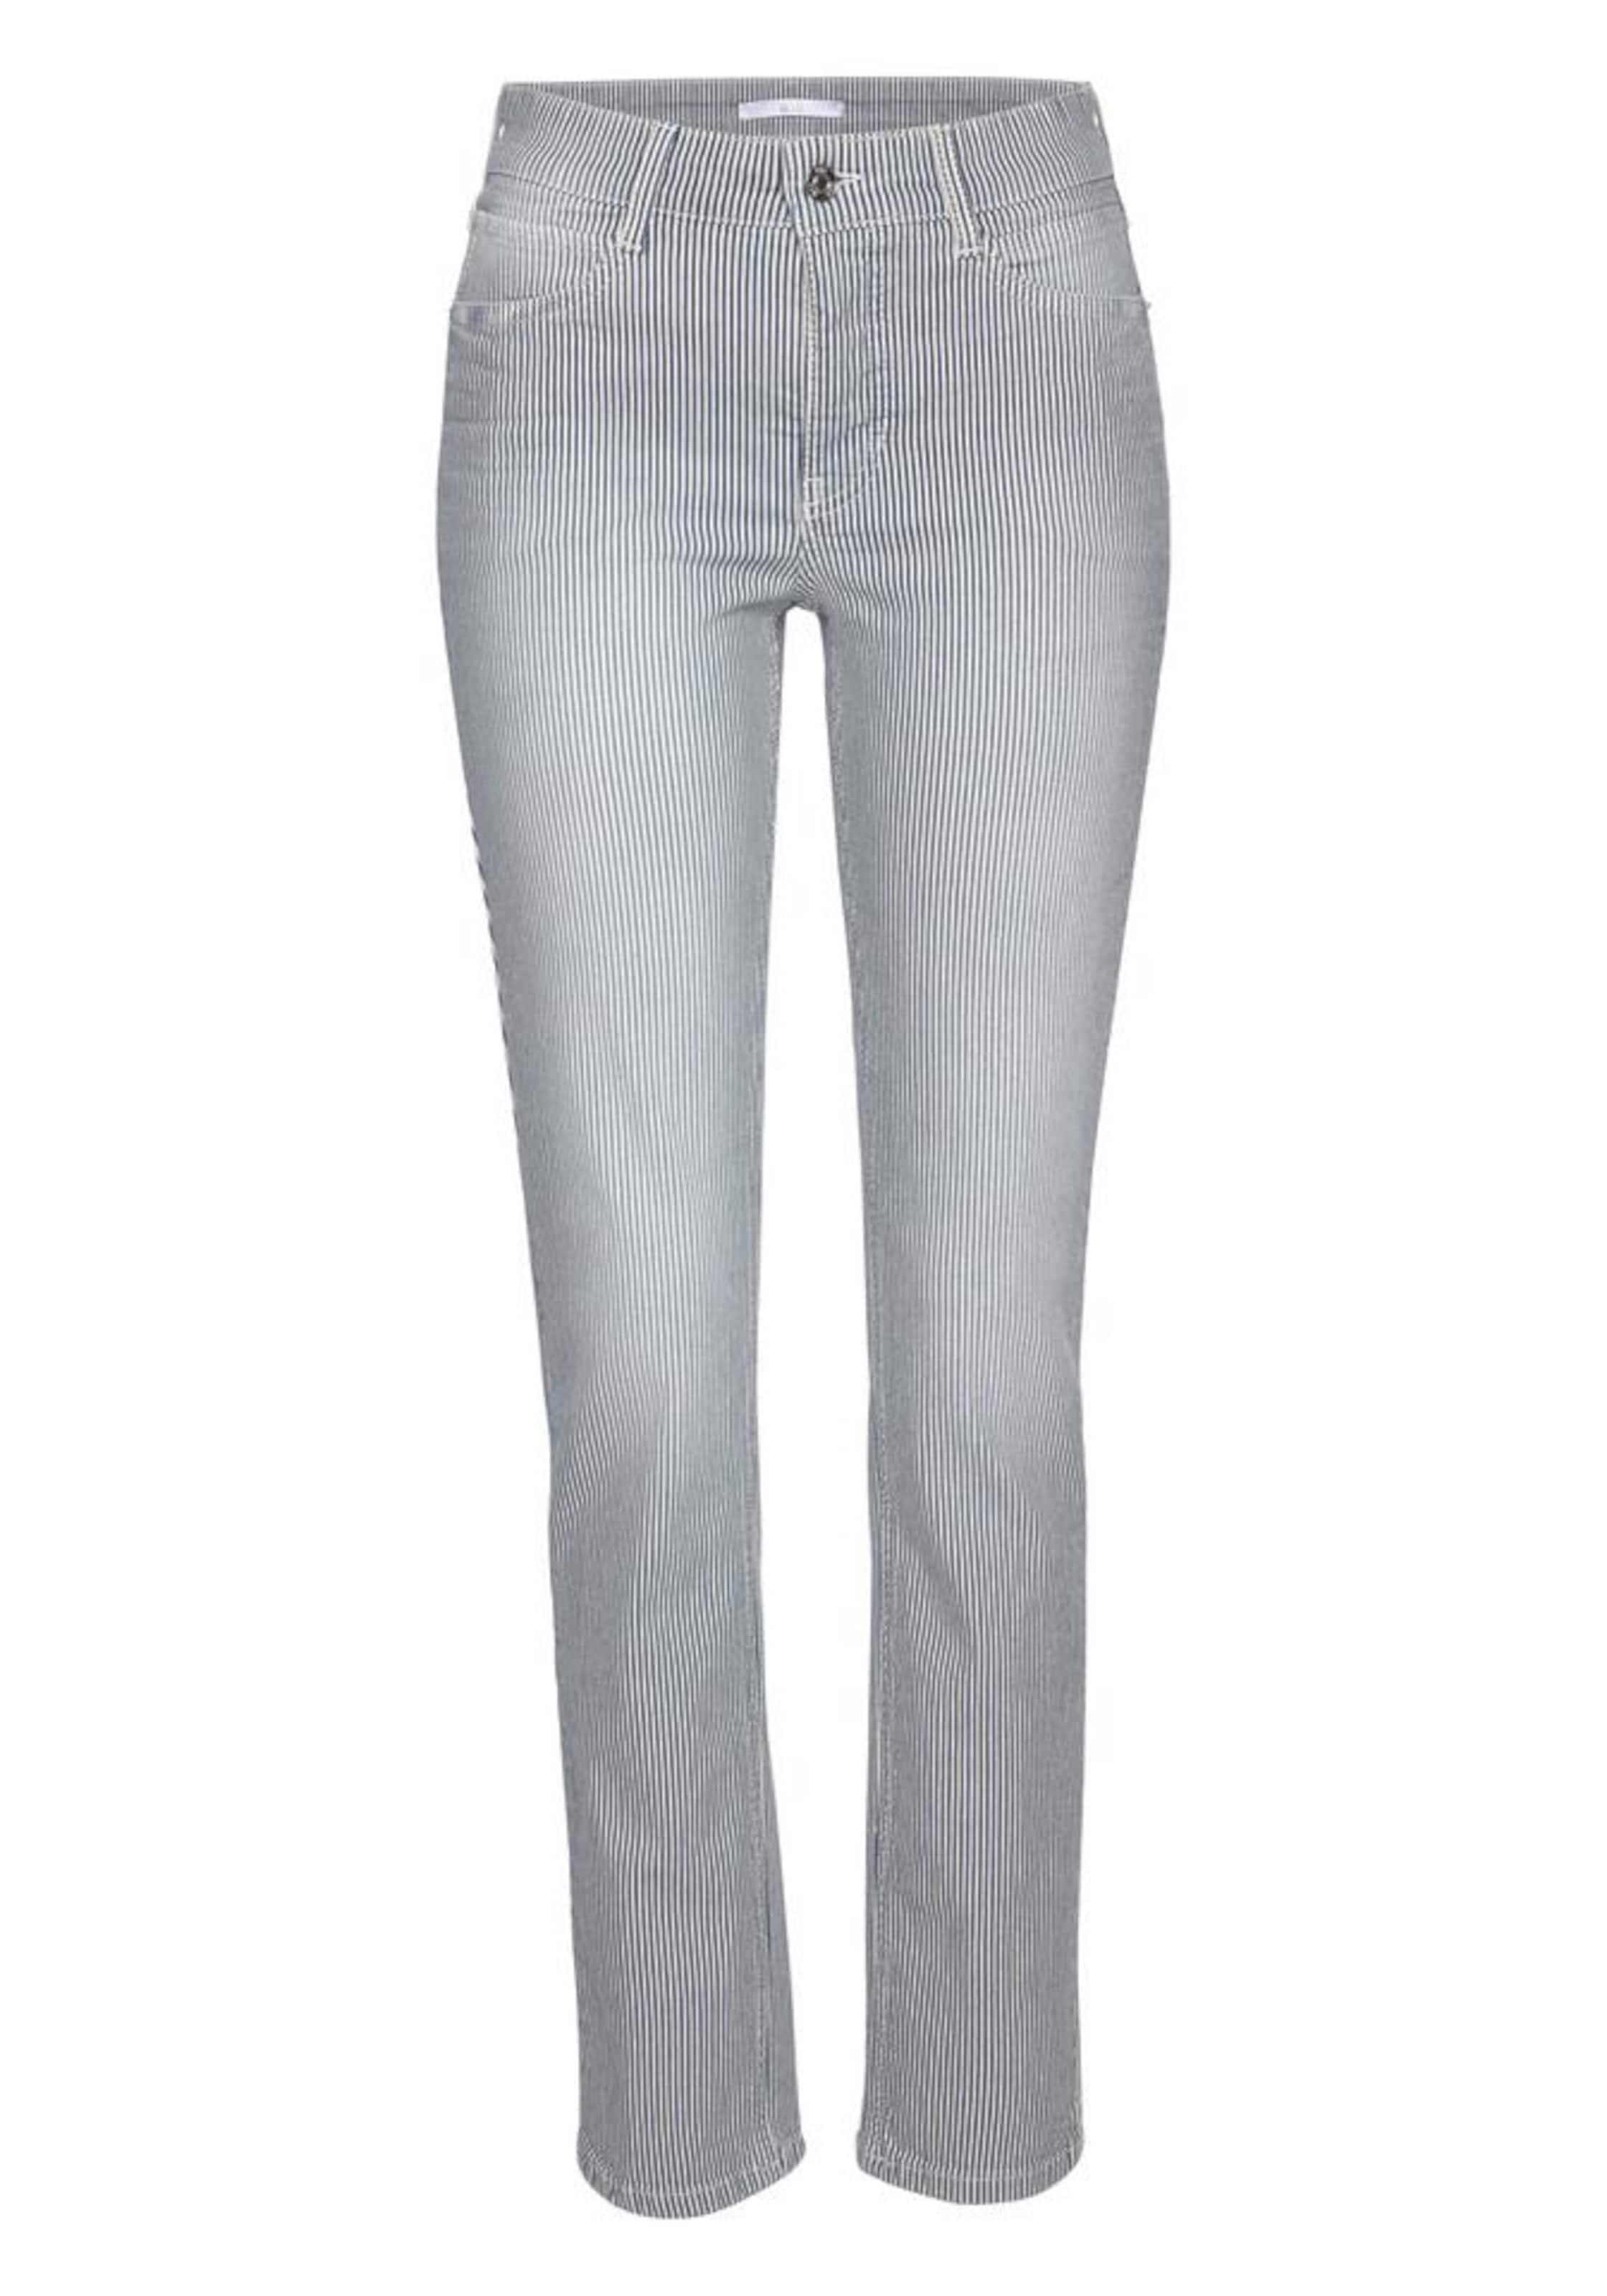 SchwarzNaturweiß Mac Jeans 'angela Stripe' In mN8vn0wO